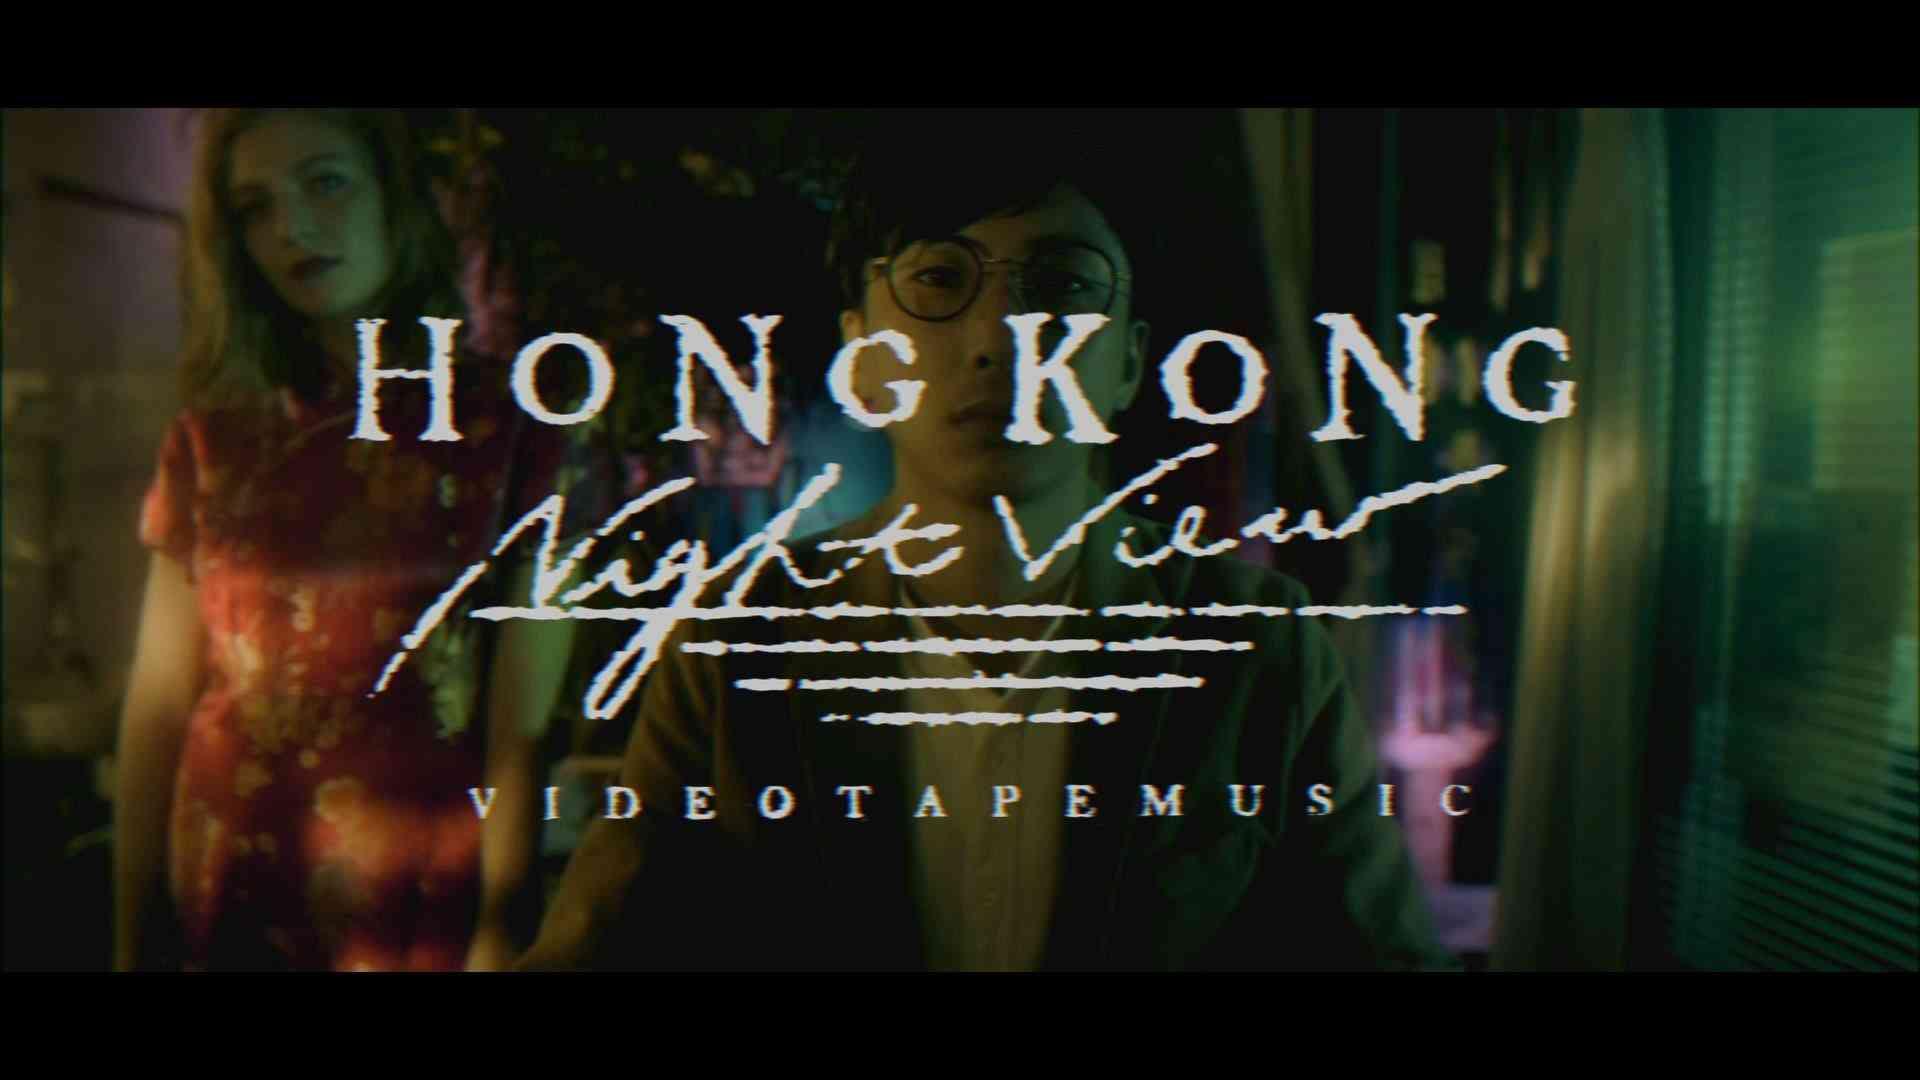 VIDEOTAPEMUSIC / ''Hong Kong Night View feat 山田参助(泊)'' - YouTube